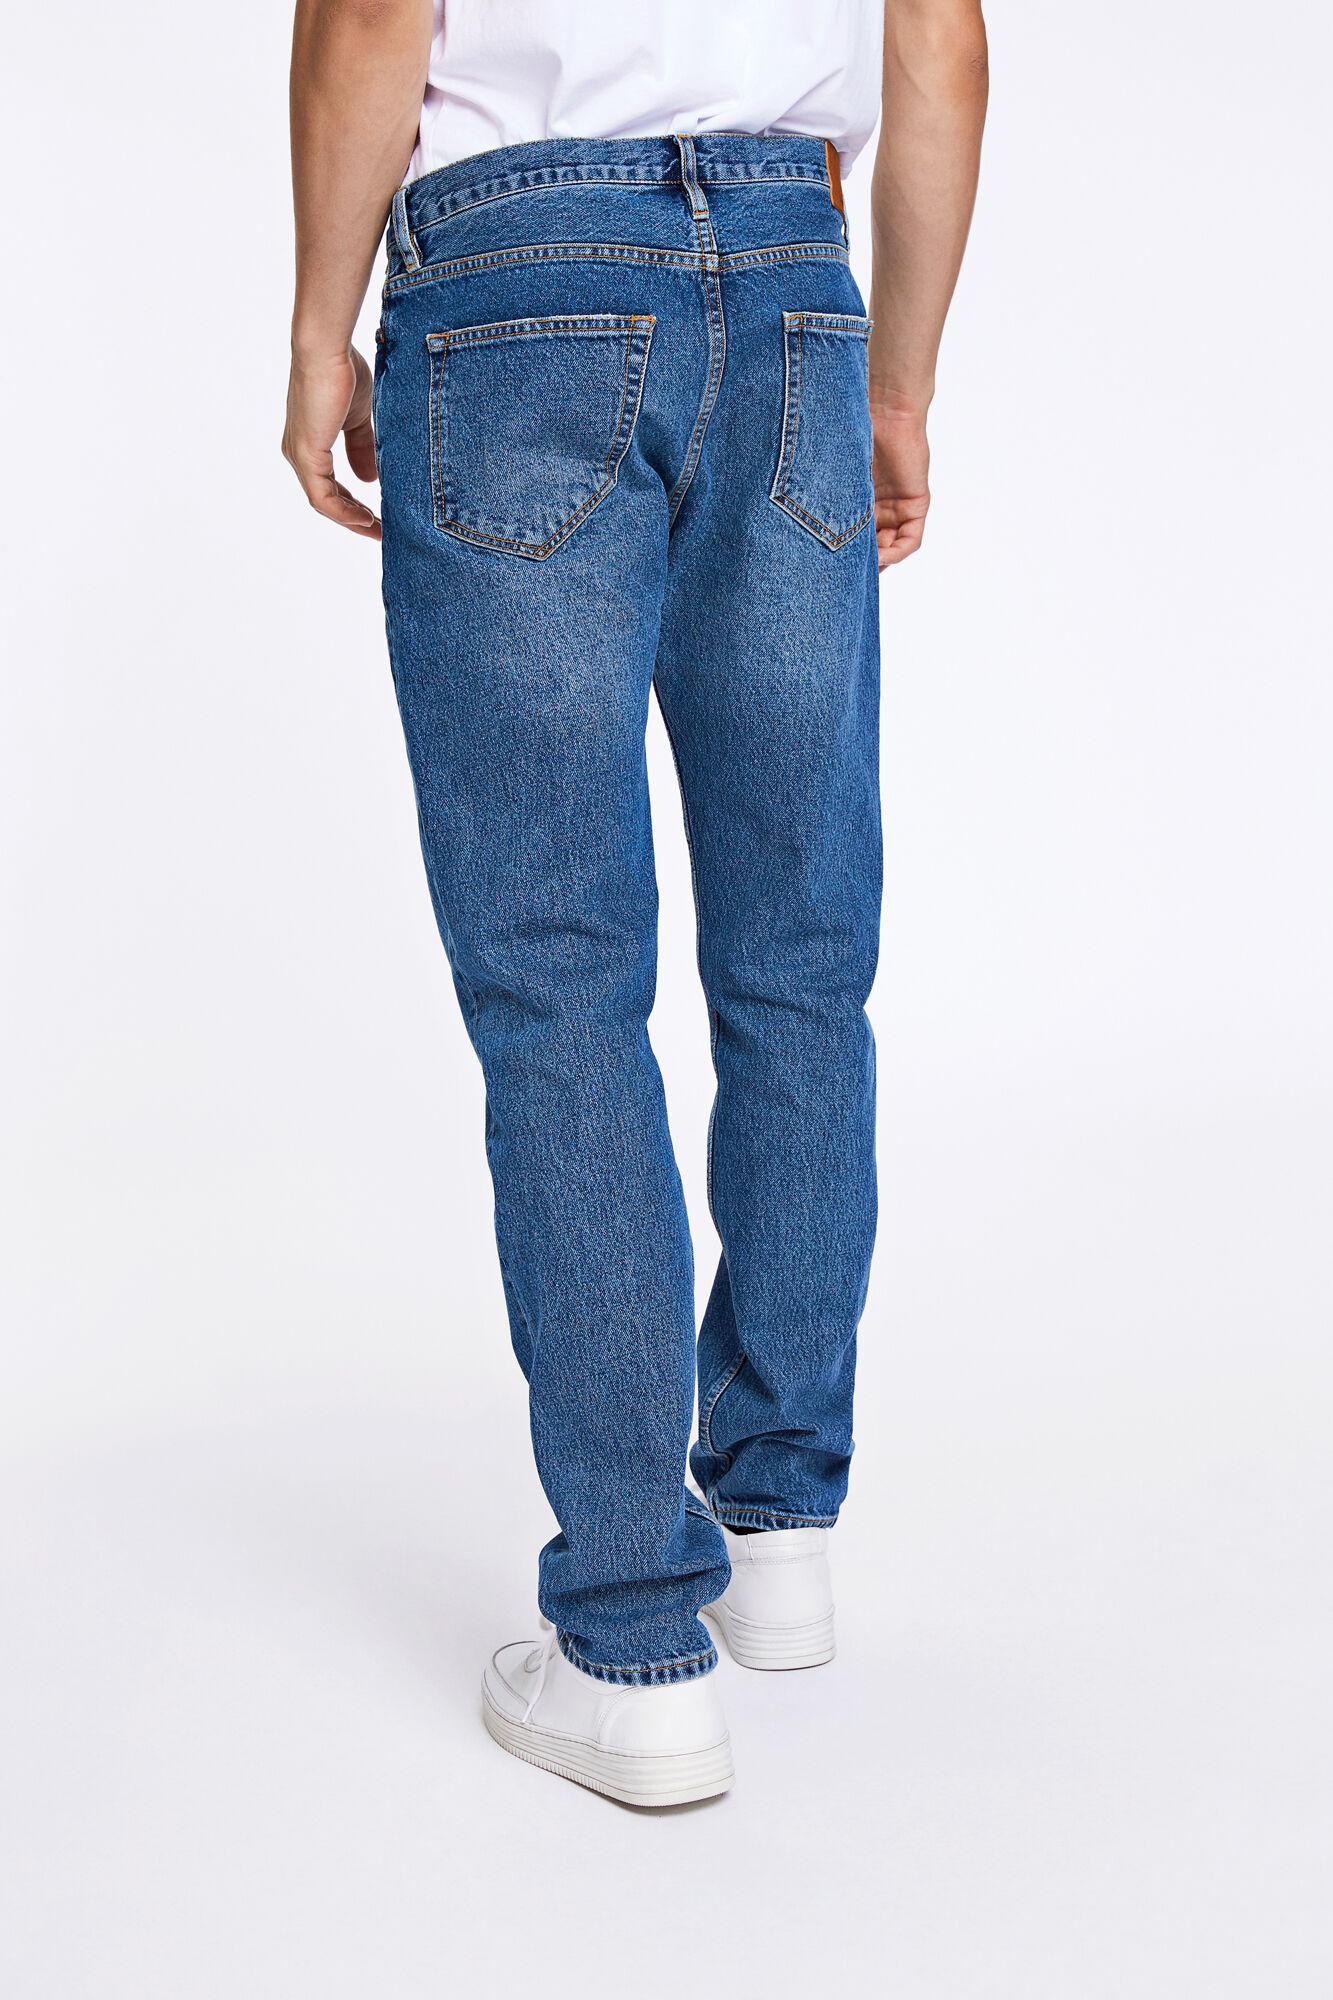 Kurt jeans 7280